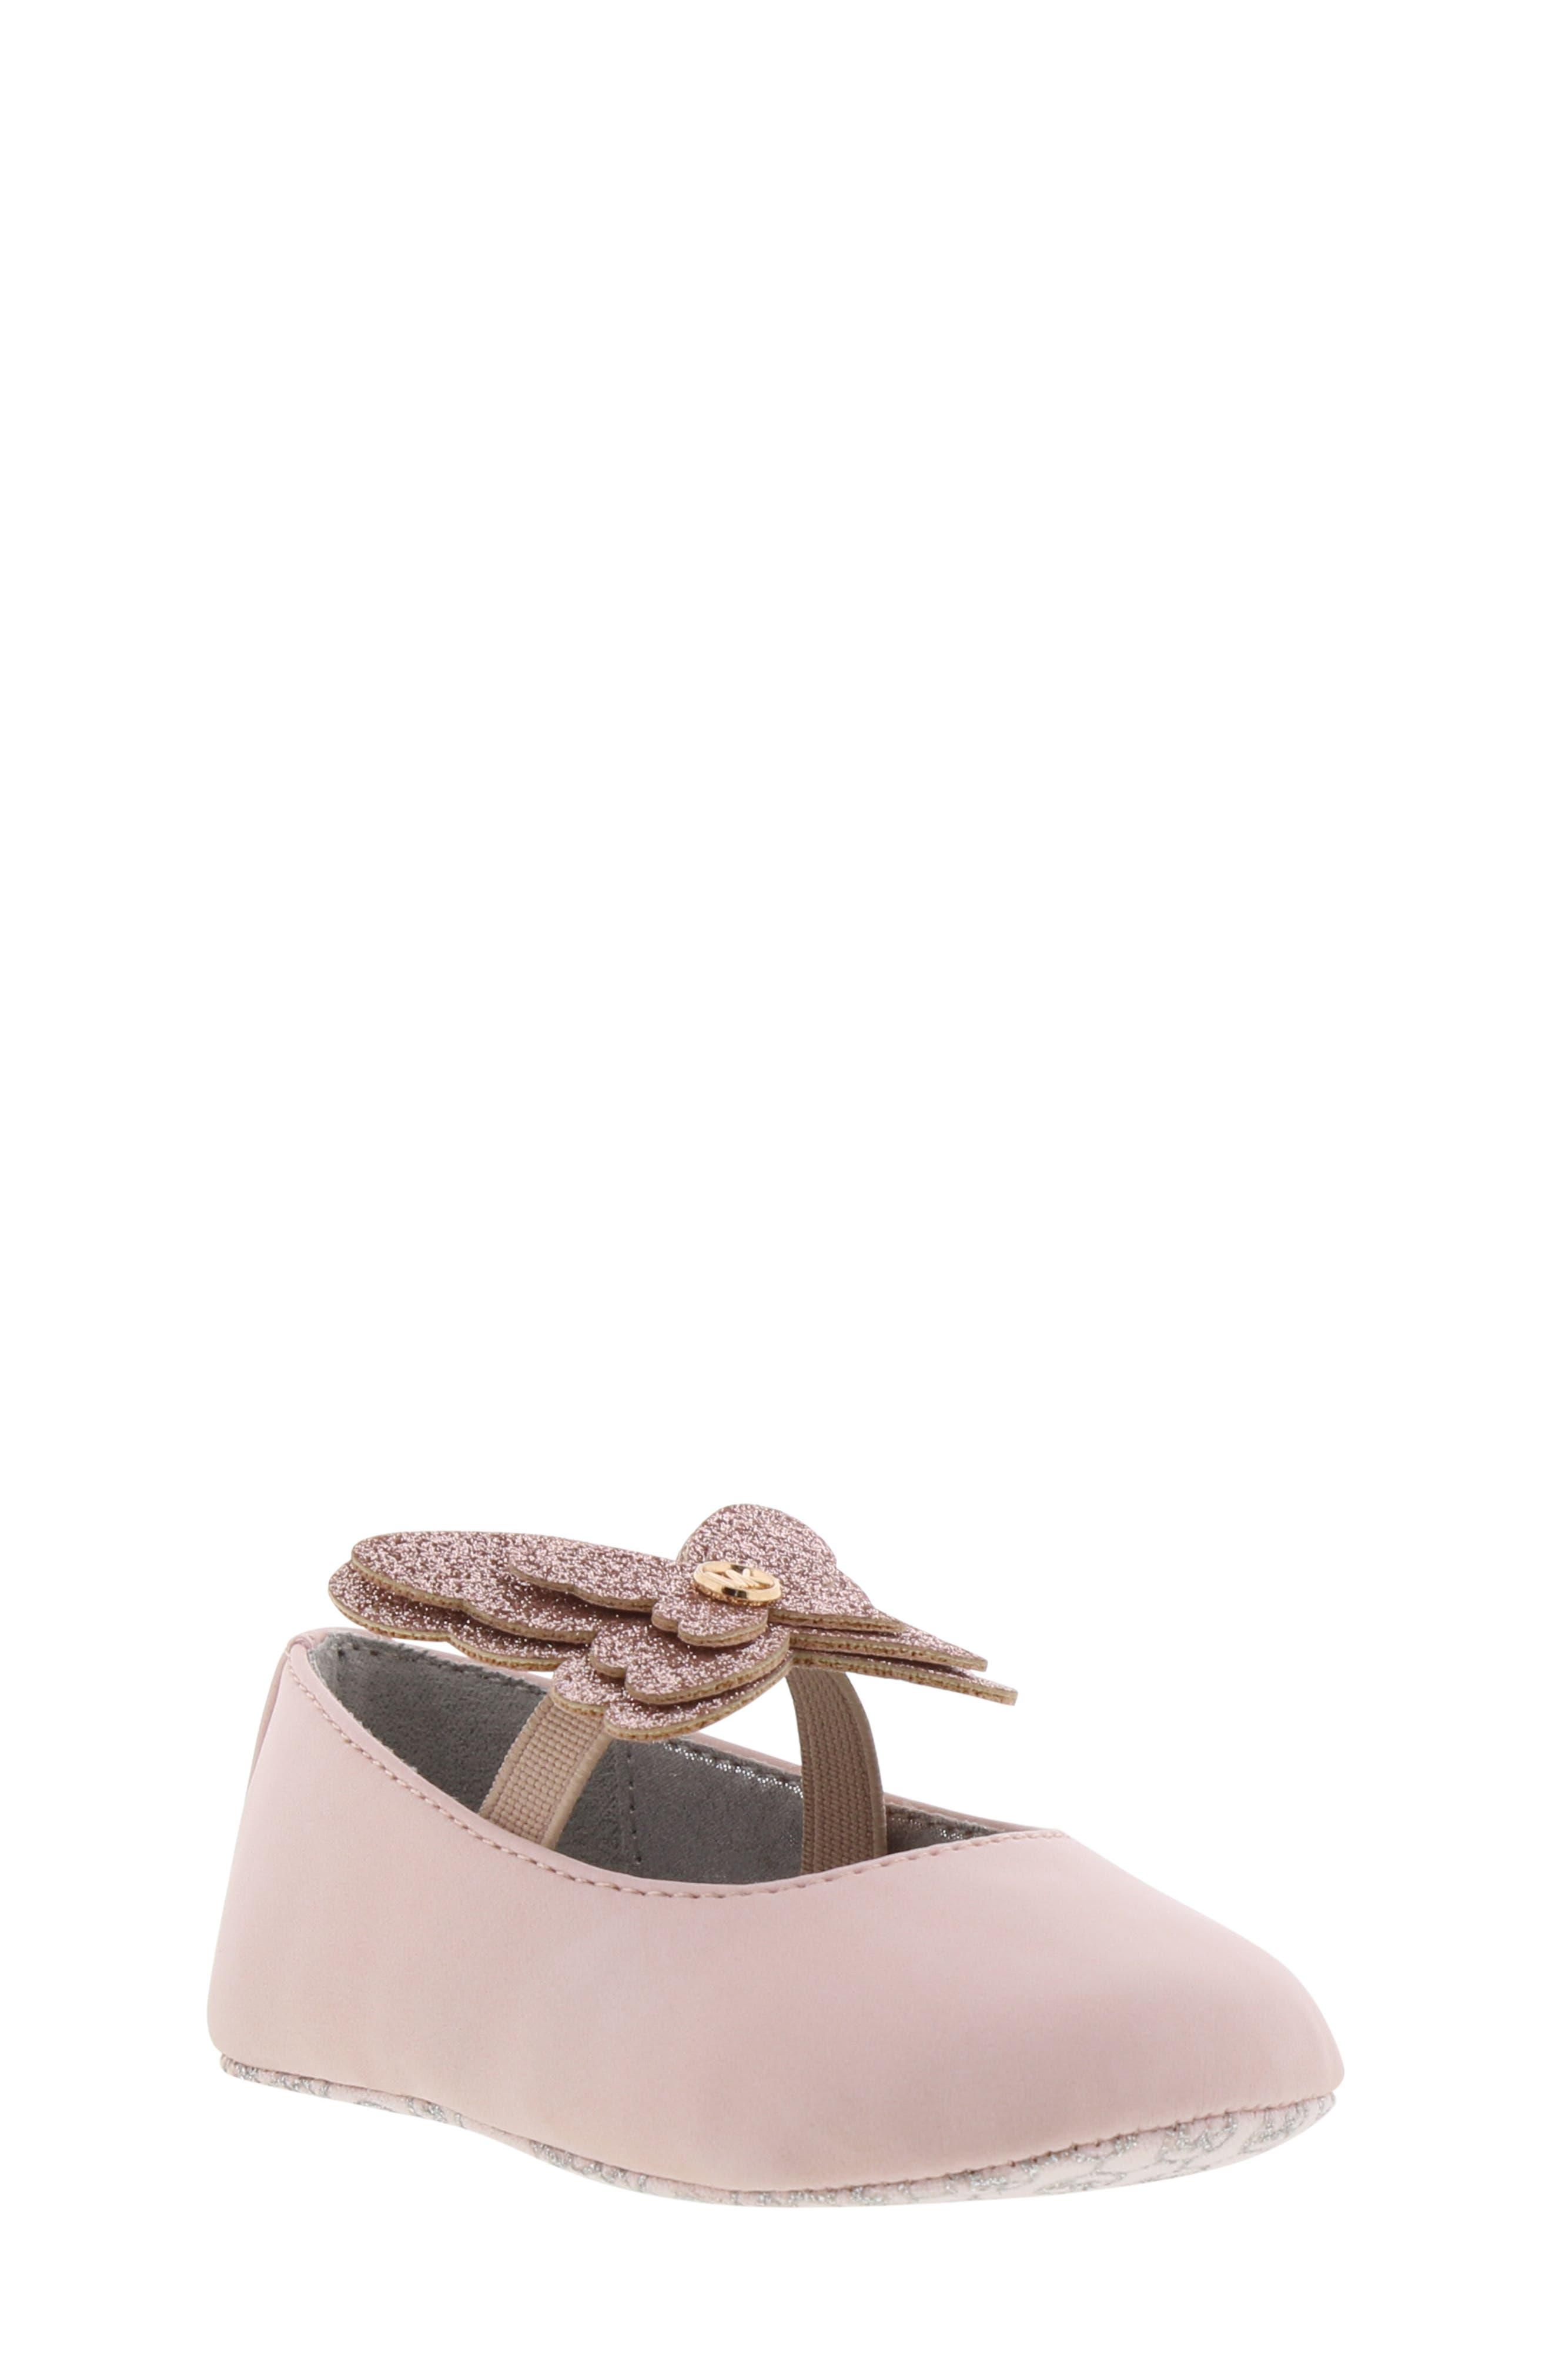 MICHAEL MICHAEL KORS Brandee Glitter Butterfly Mary Jane, Main, color, BLUSH